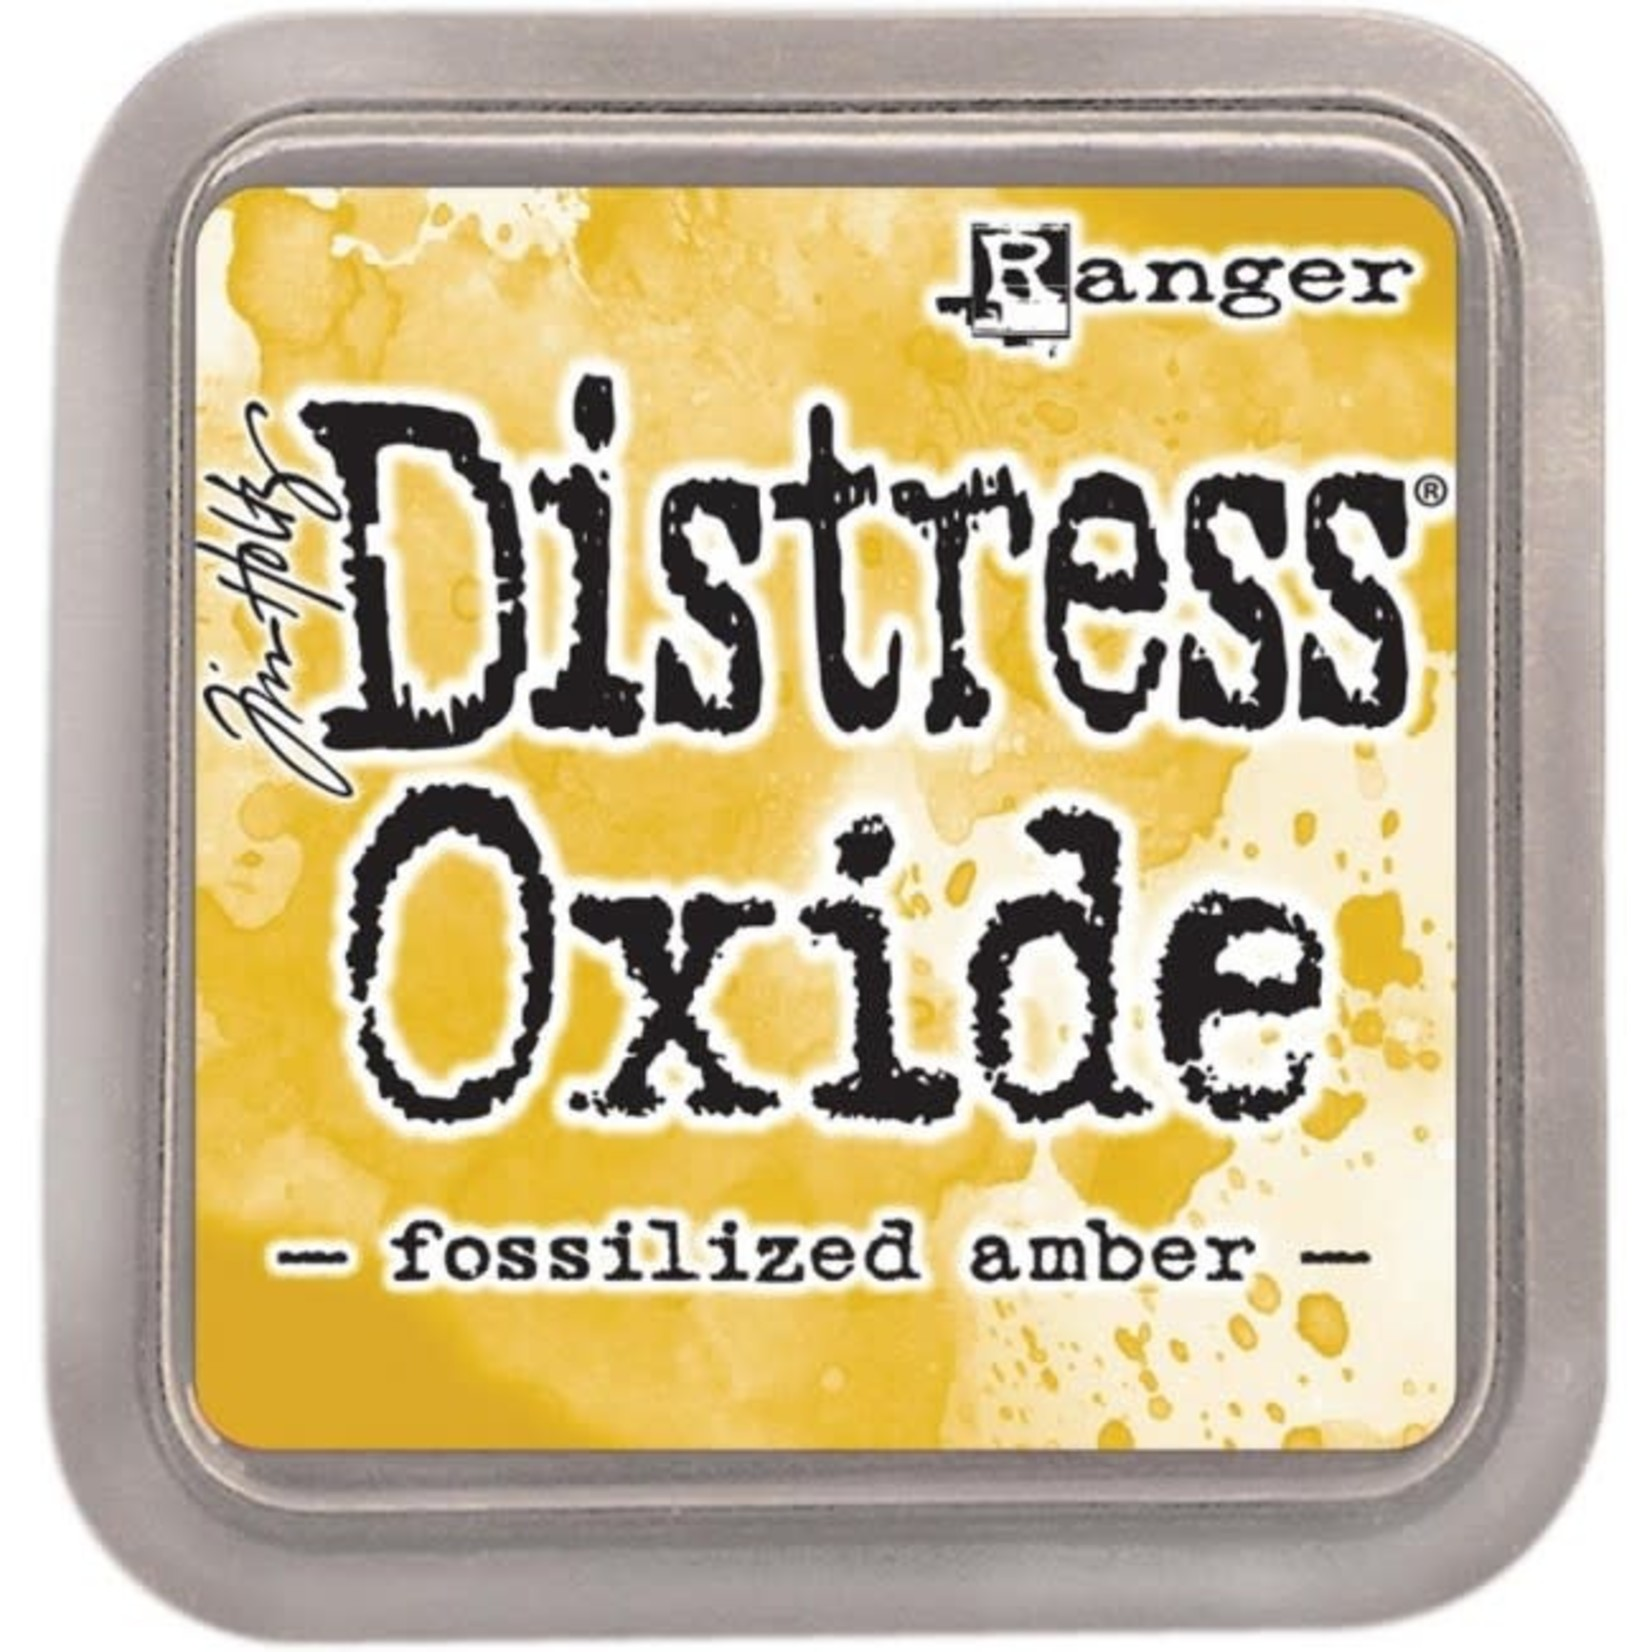 Tim Holtz Tim Holtz Distress Oxides Ink Pad Fossilized Amber